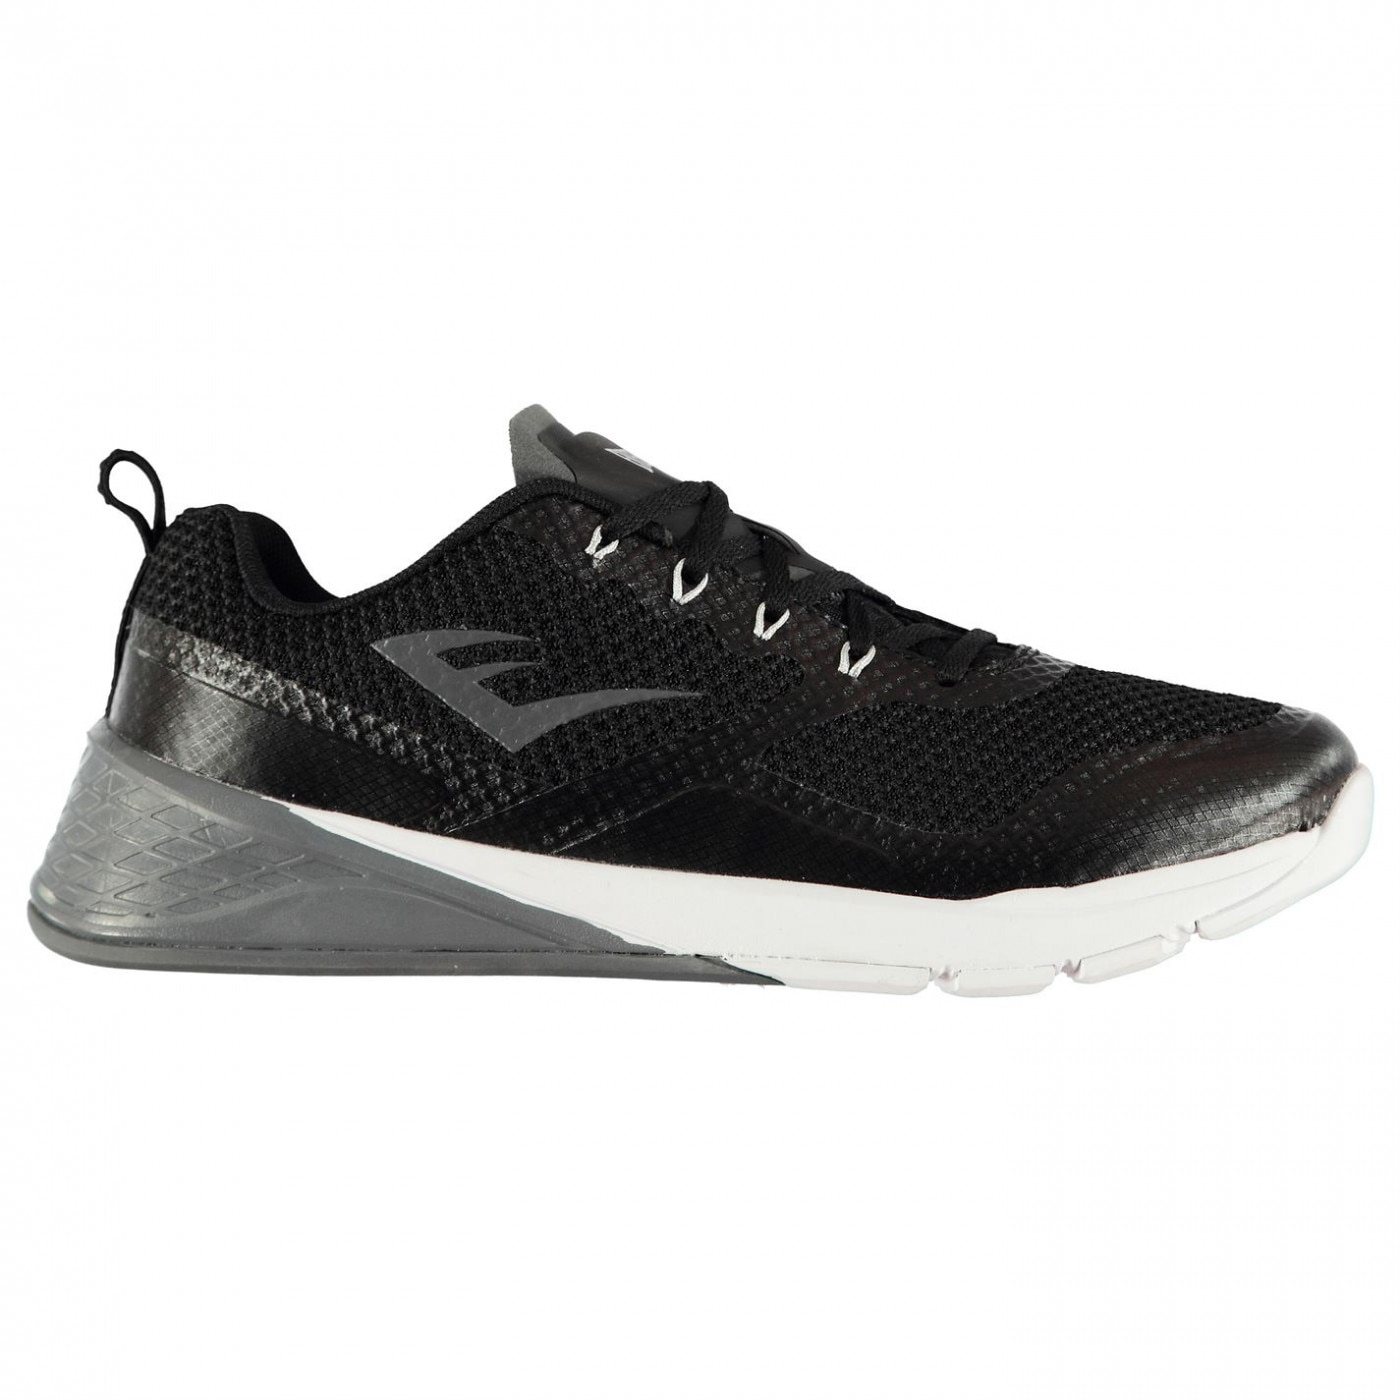 Everlast Max Rep Training Shoes Mens